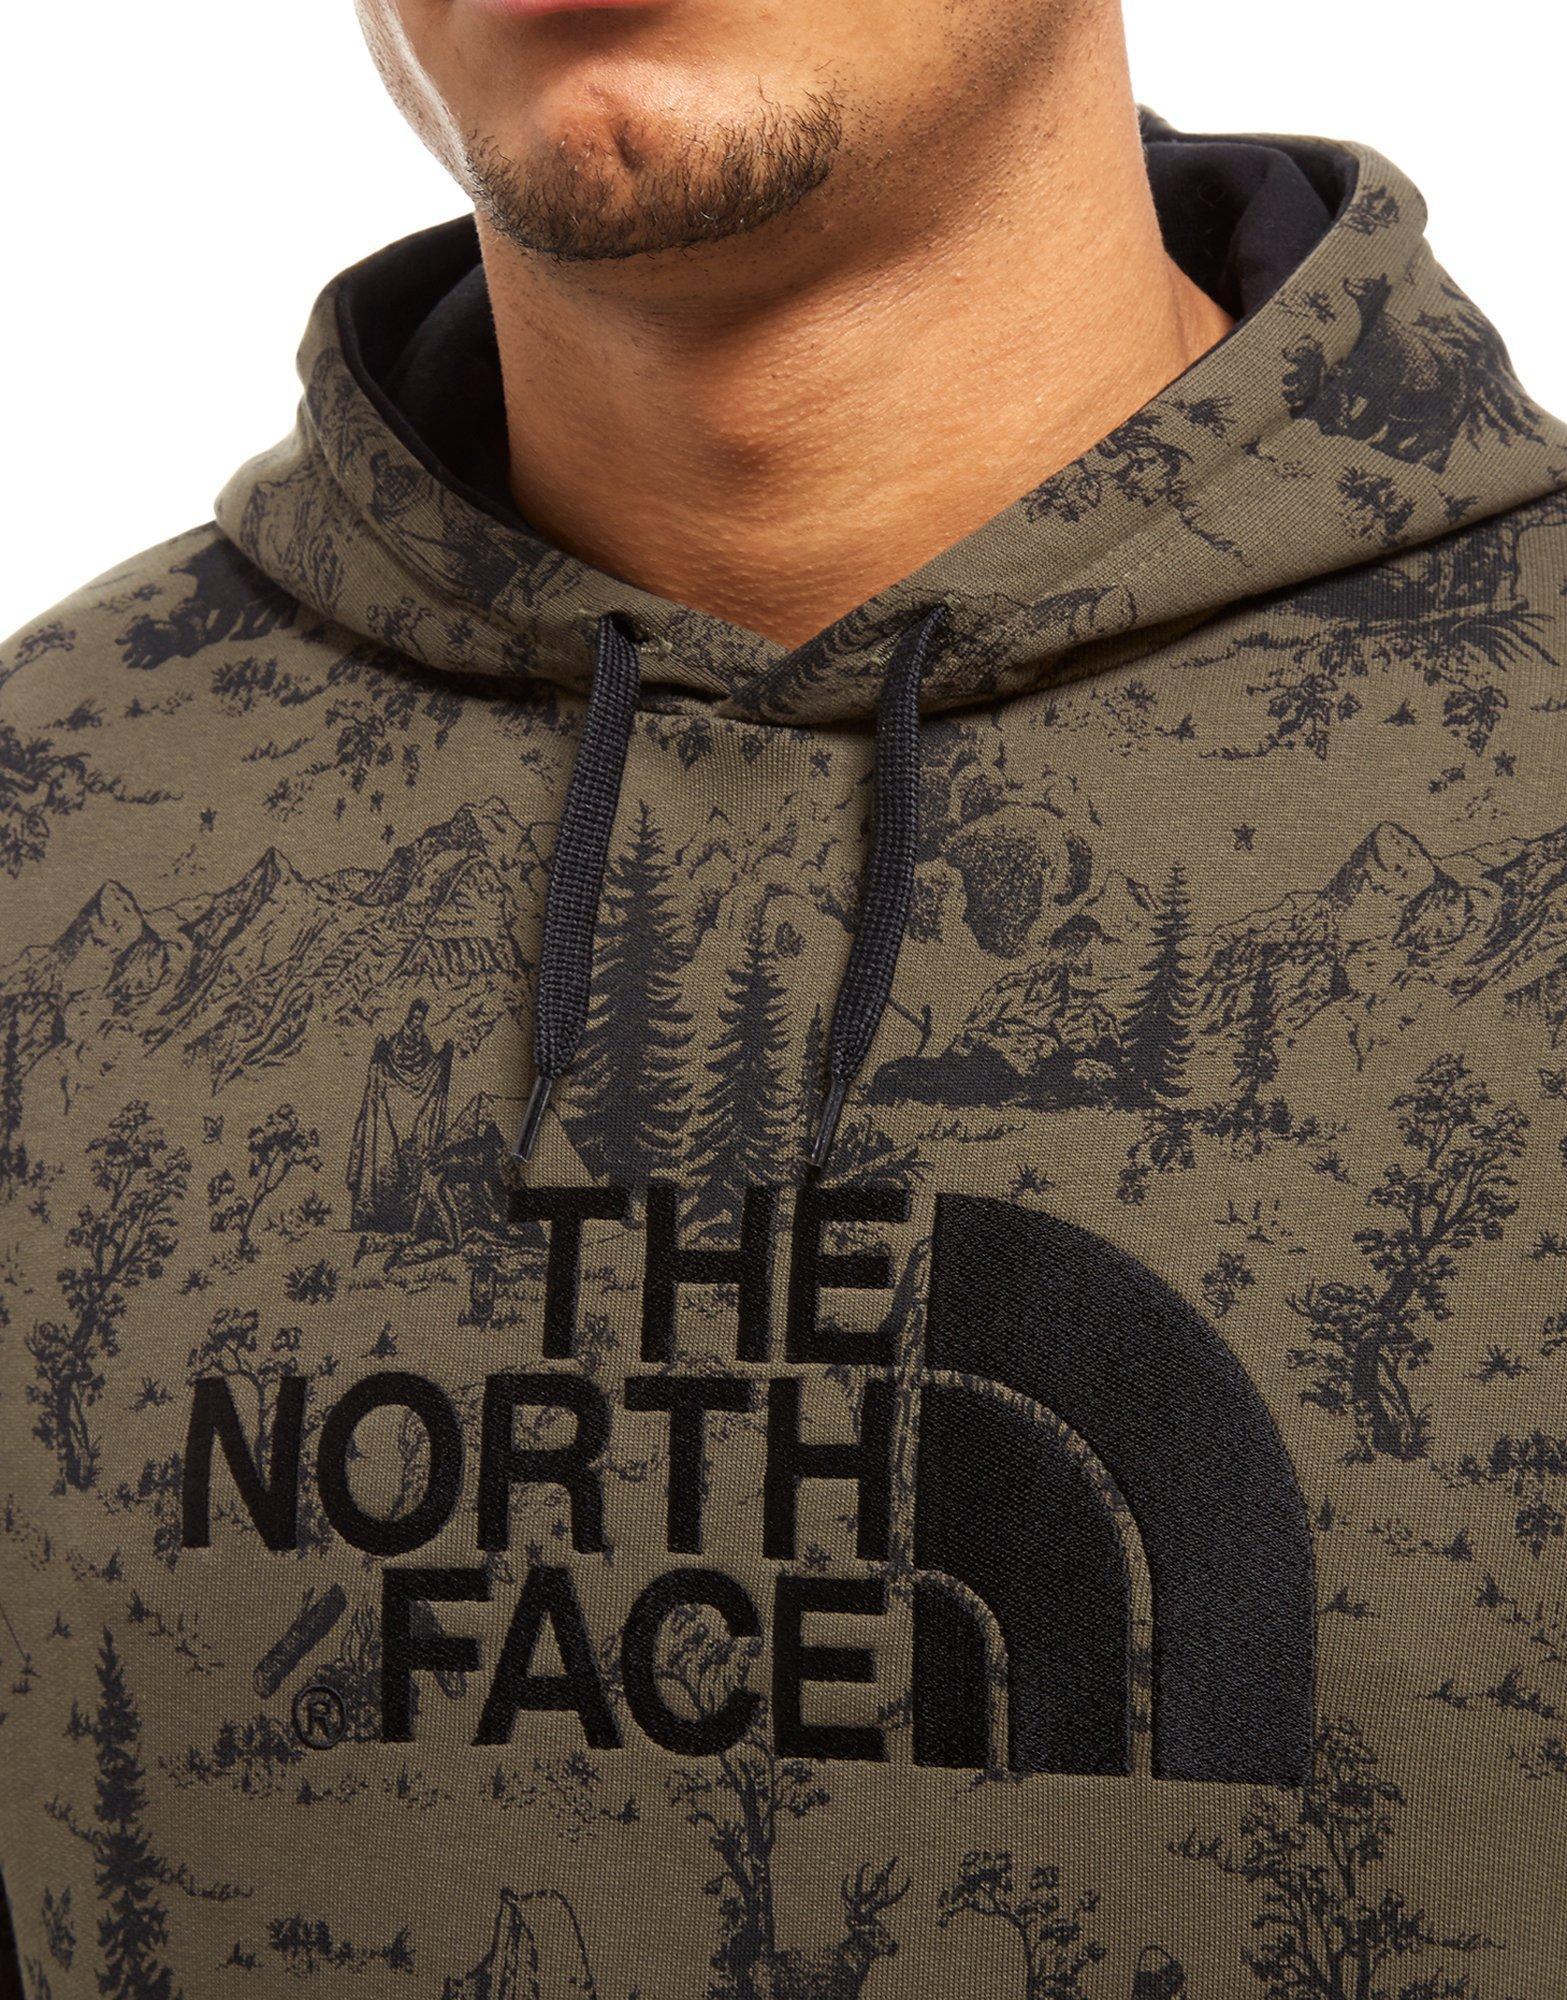 The North Face Cotton Drew Peak All Over Print Hoodie in Khaki/Black (Black) for Men